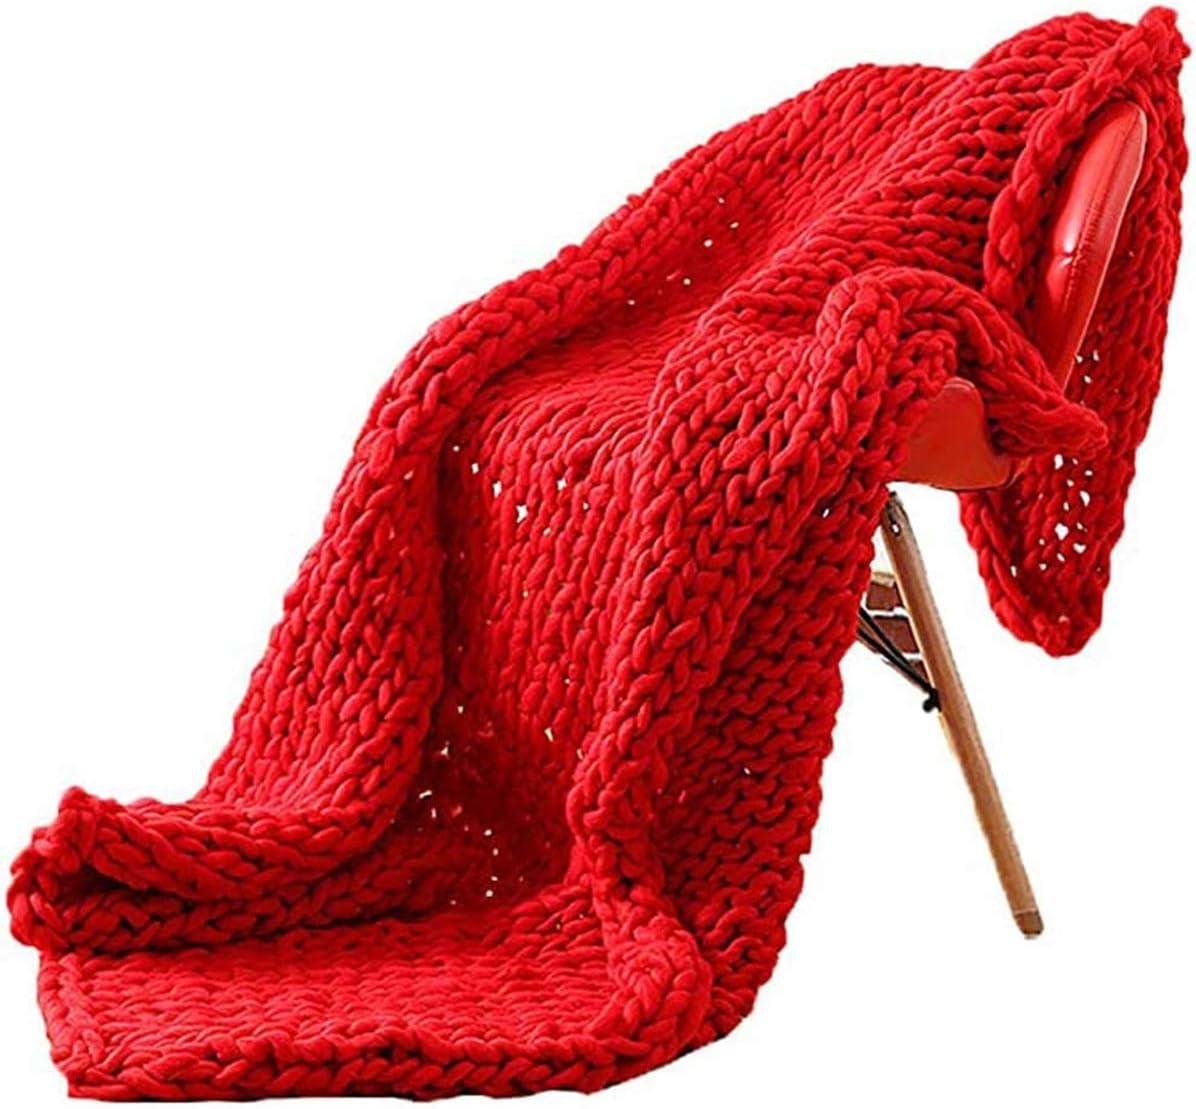 Overseas parallel import regular item GUOYUN Large Soft Chunky Knit Handmade special price Bla Knitting Blanket Yarn